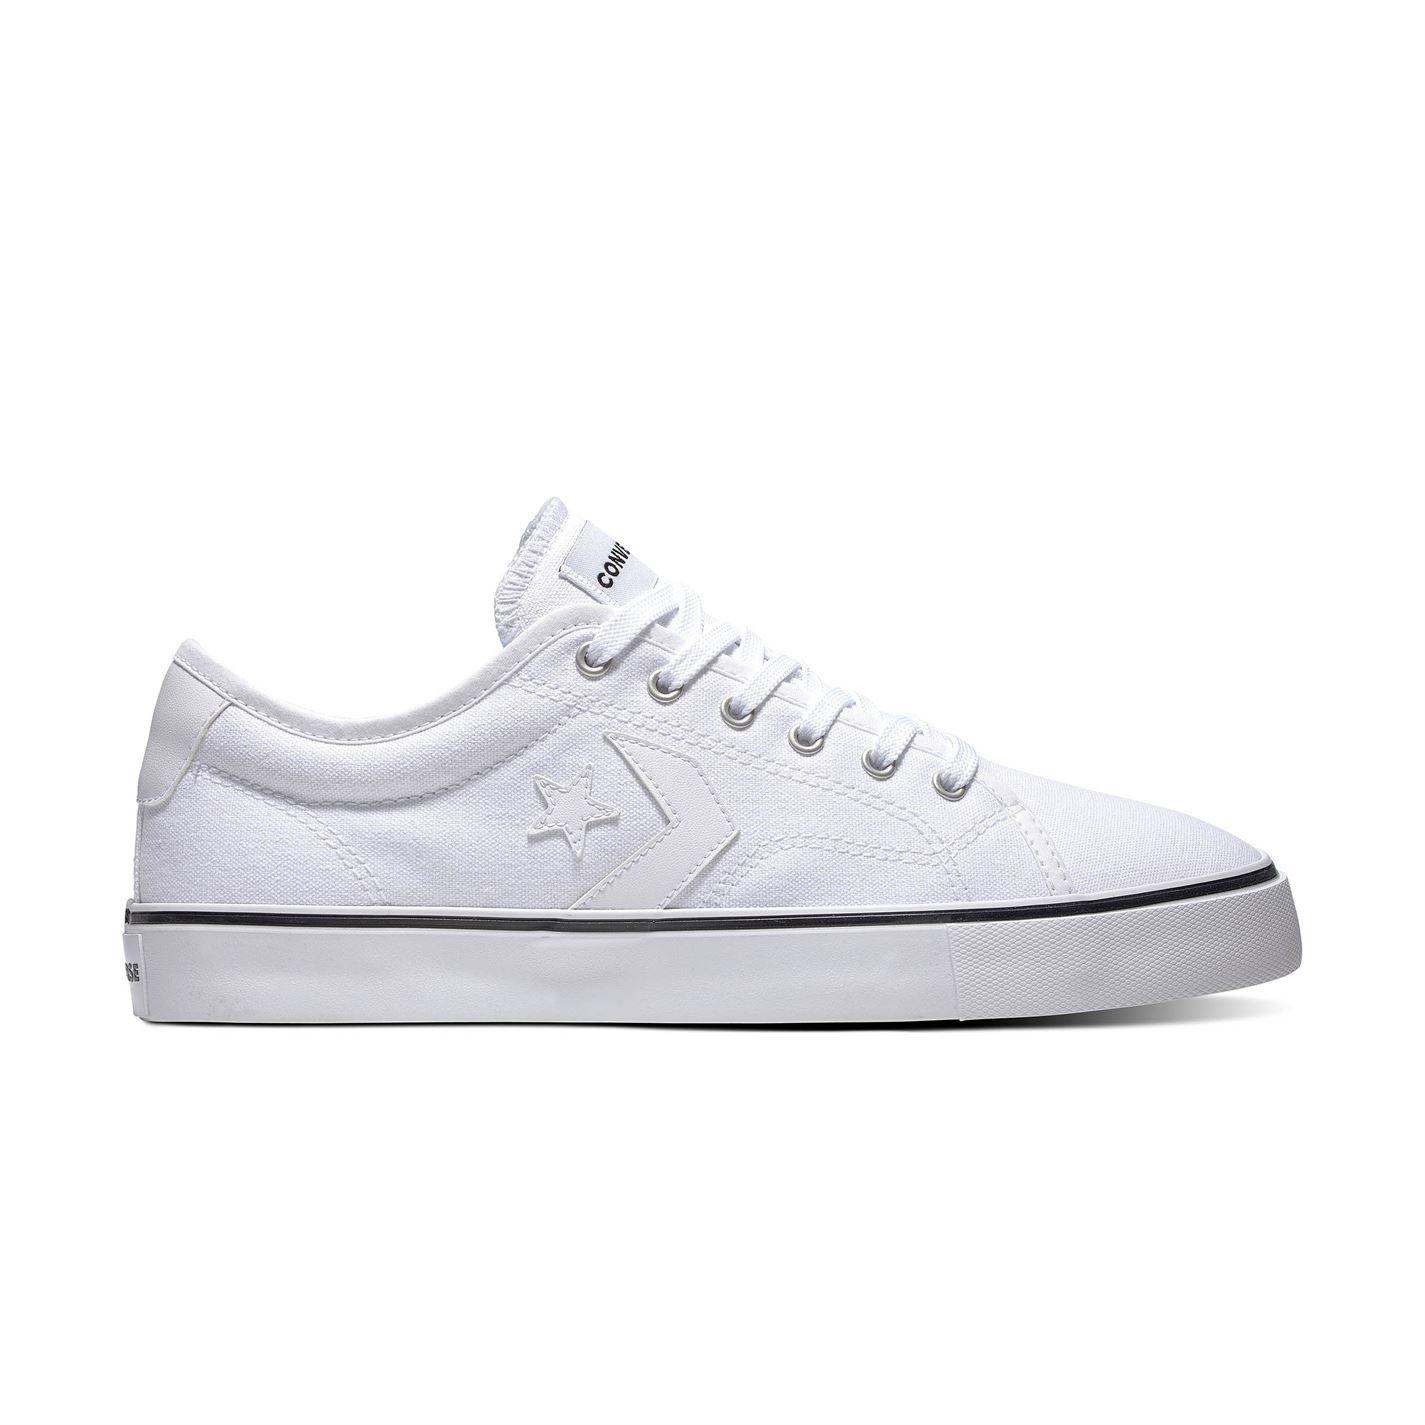 Converse-Ox-REPLAY-Baskets-Pour-Homme-Chaussures-De-Loisirs-Chaussures-Baskets miniature 27